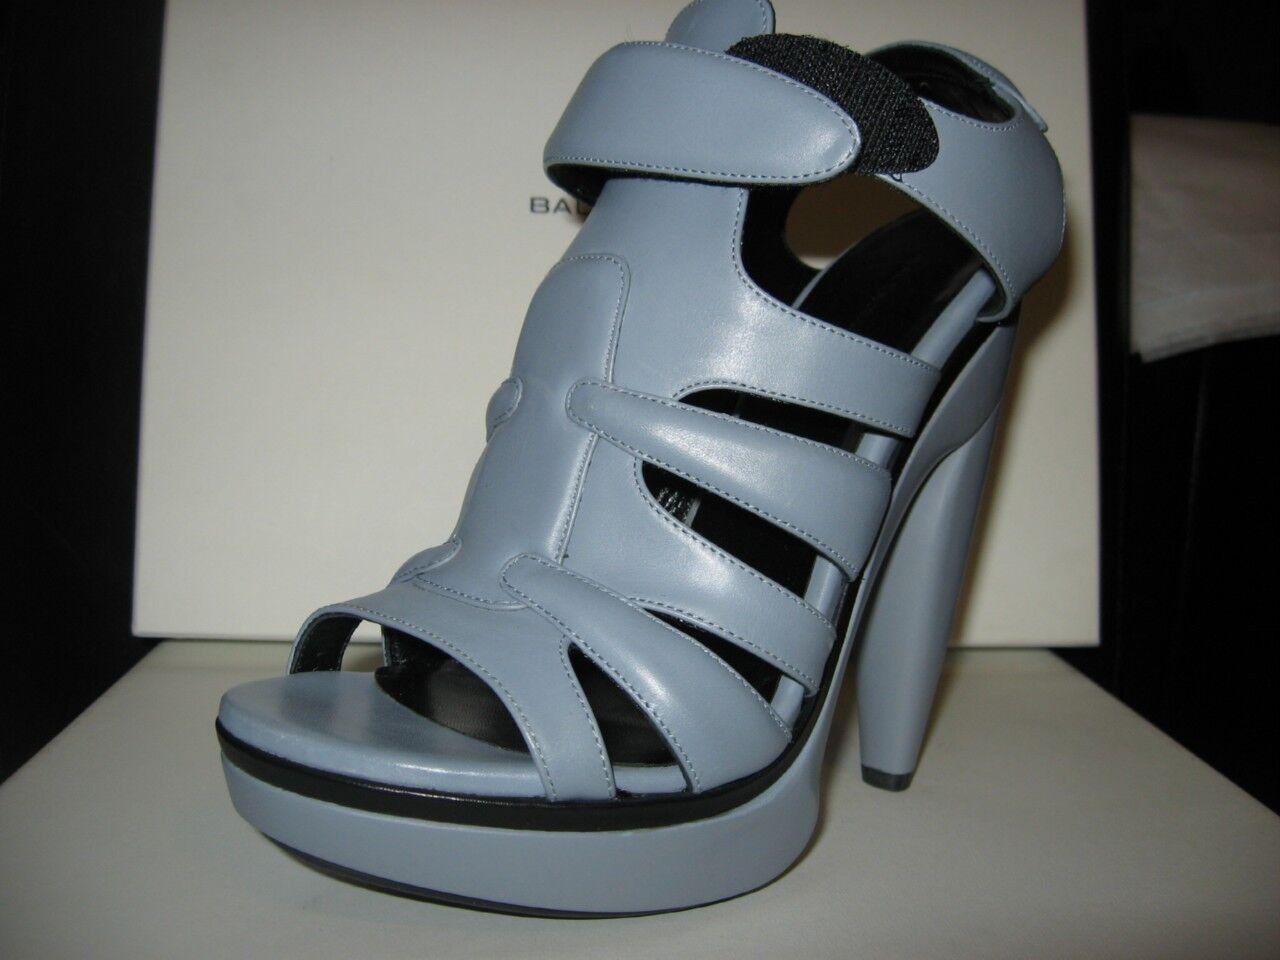 BALENCIAGA Platfrom Gladiator Clog Sandal shoes 37 7